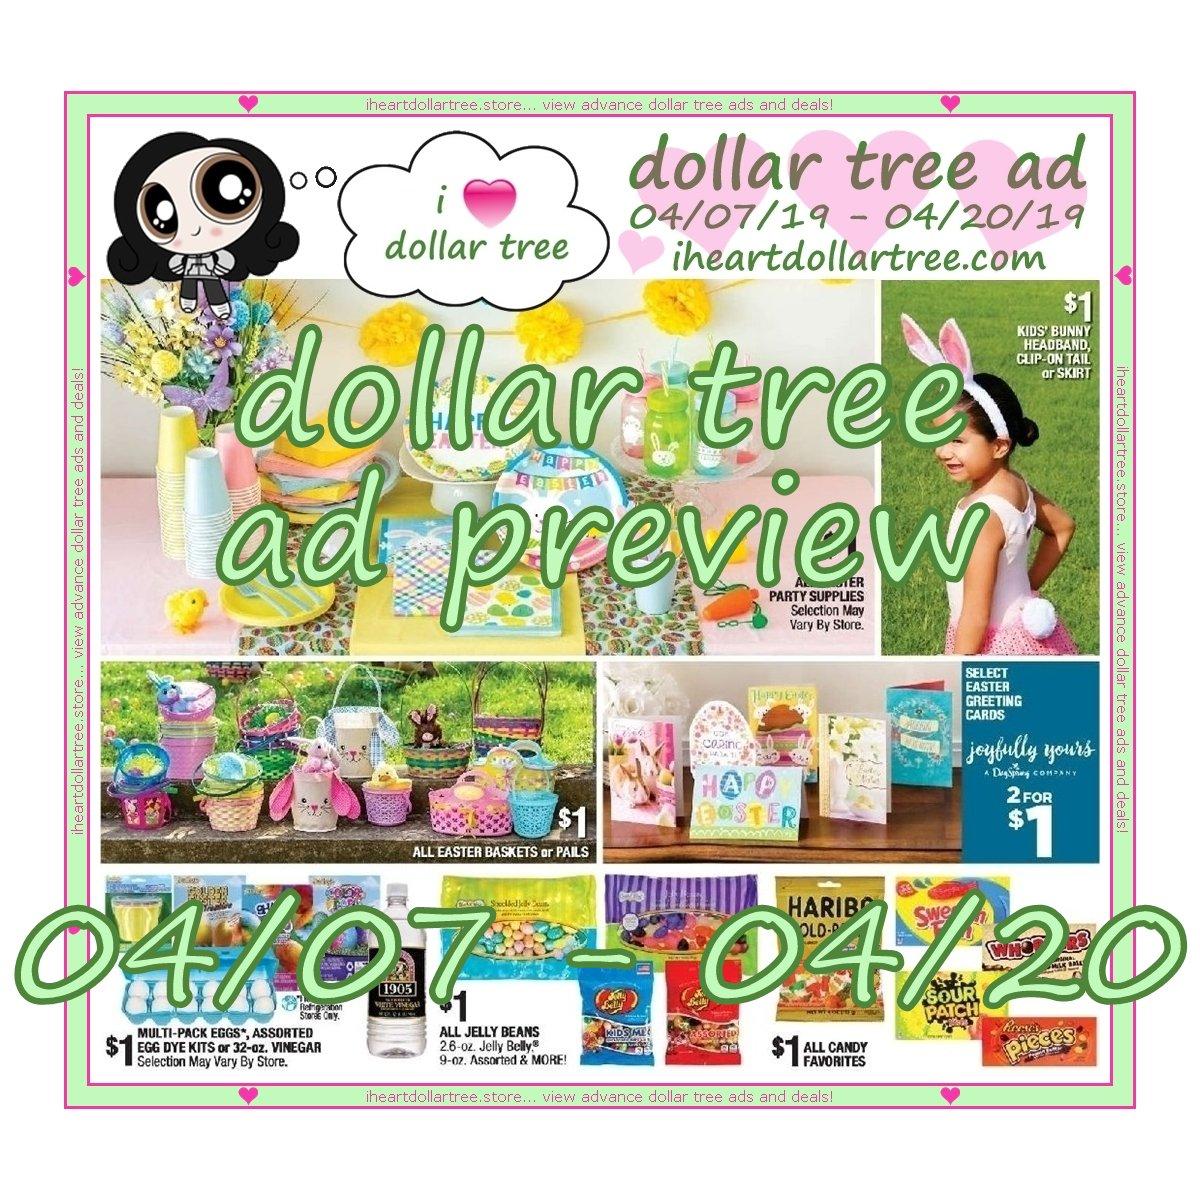 i 💚 dollar tree - @ihartdollartree Twitter Profile and Downloader